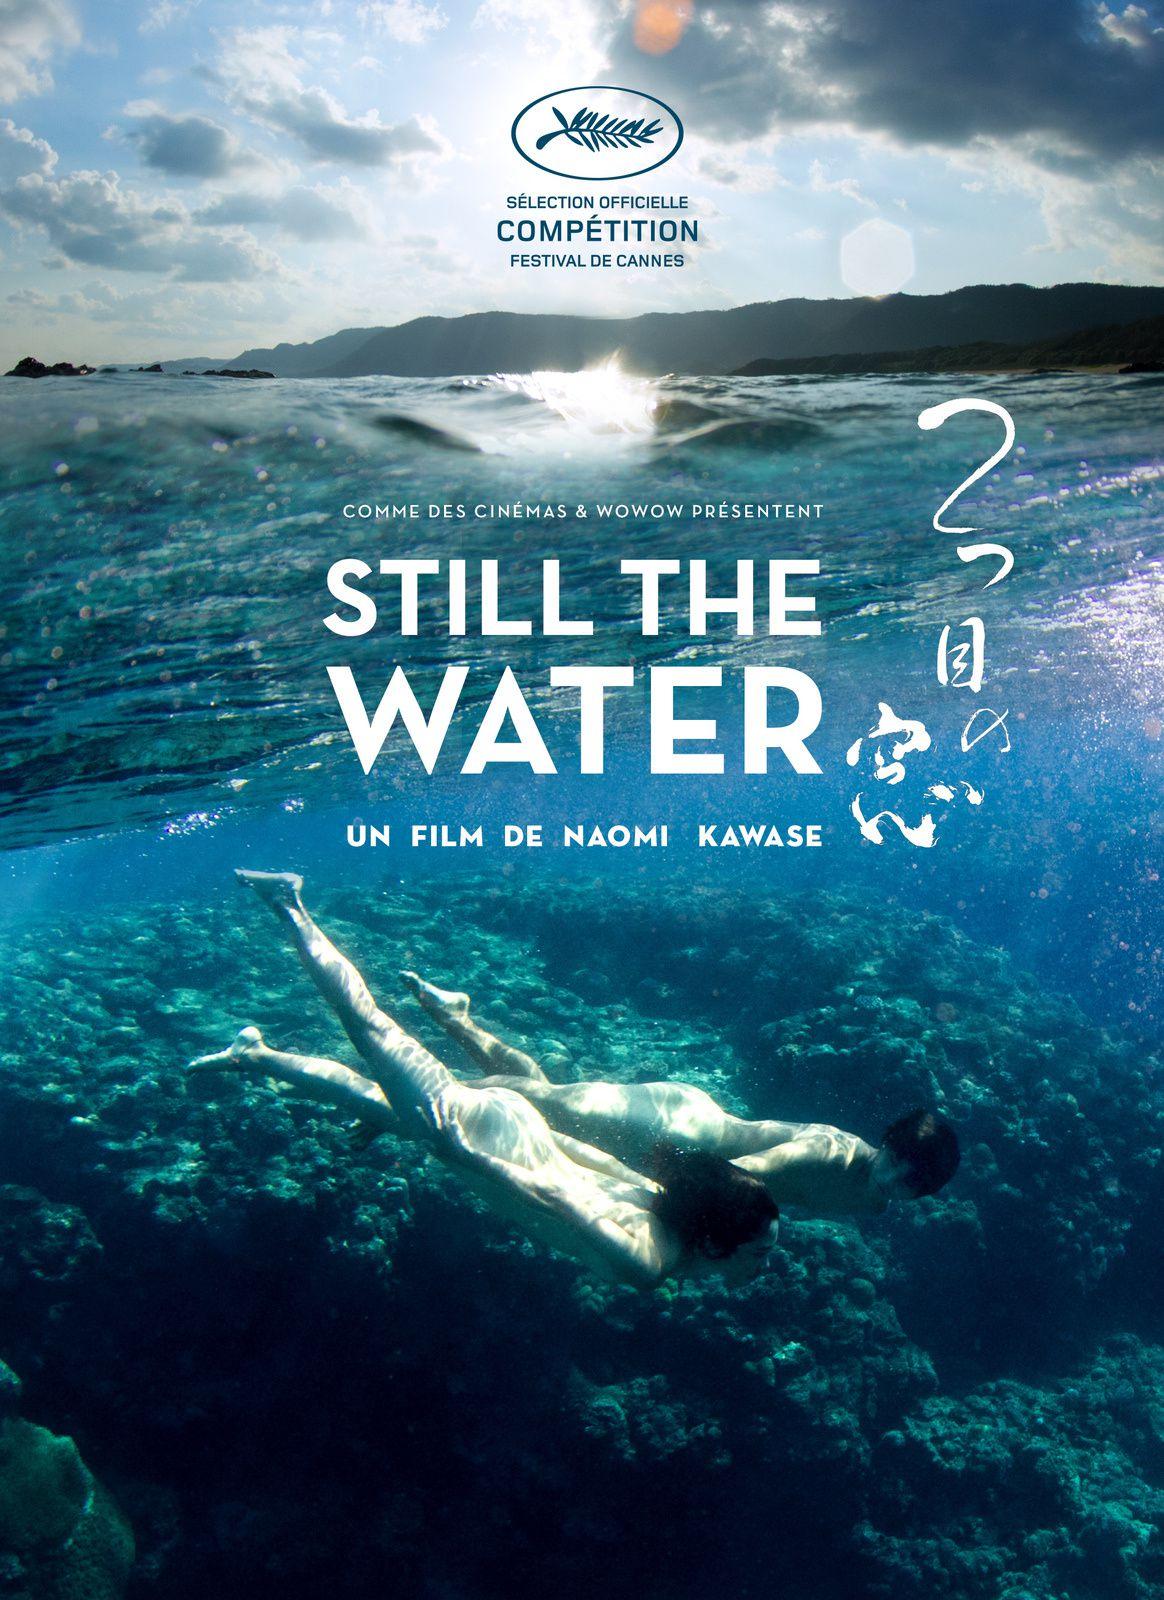 Still the Water (BANDE ANNONCE VOST) de Naomi Kawase - 01 10 2014 (Futatsume no mado)